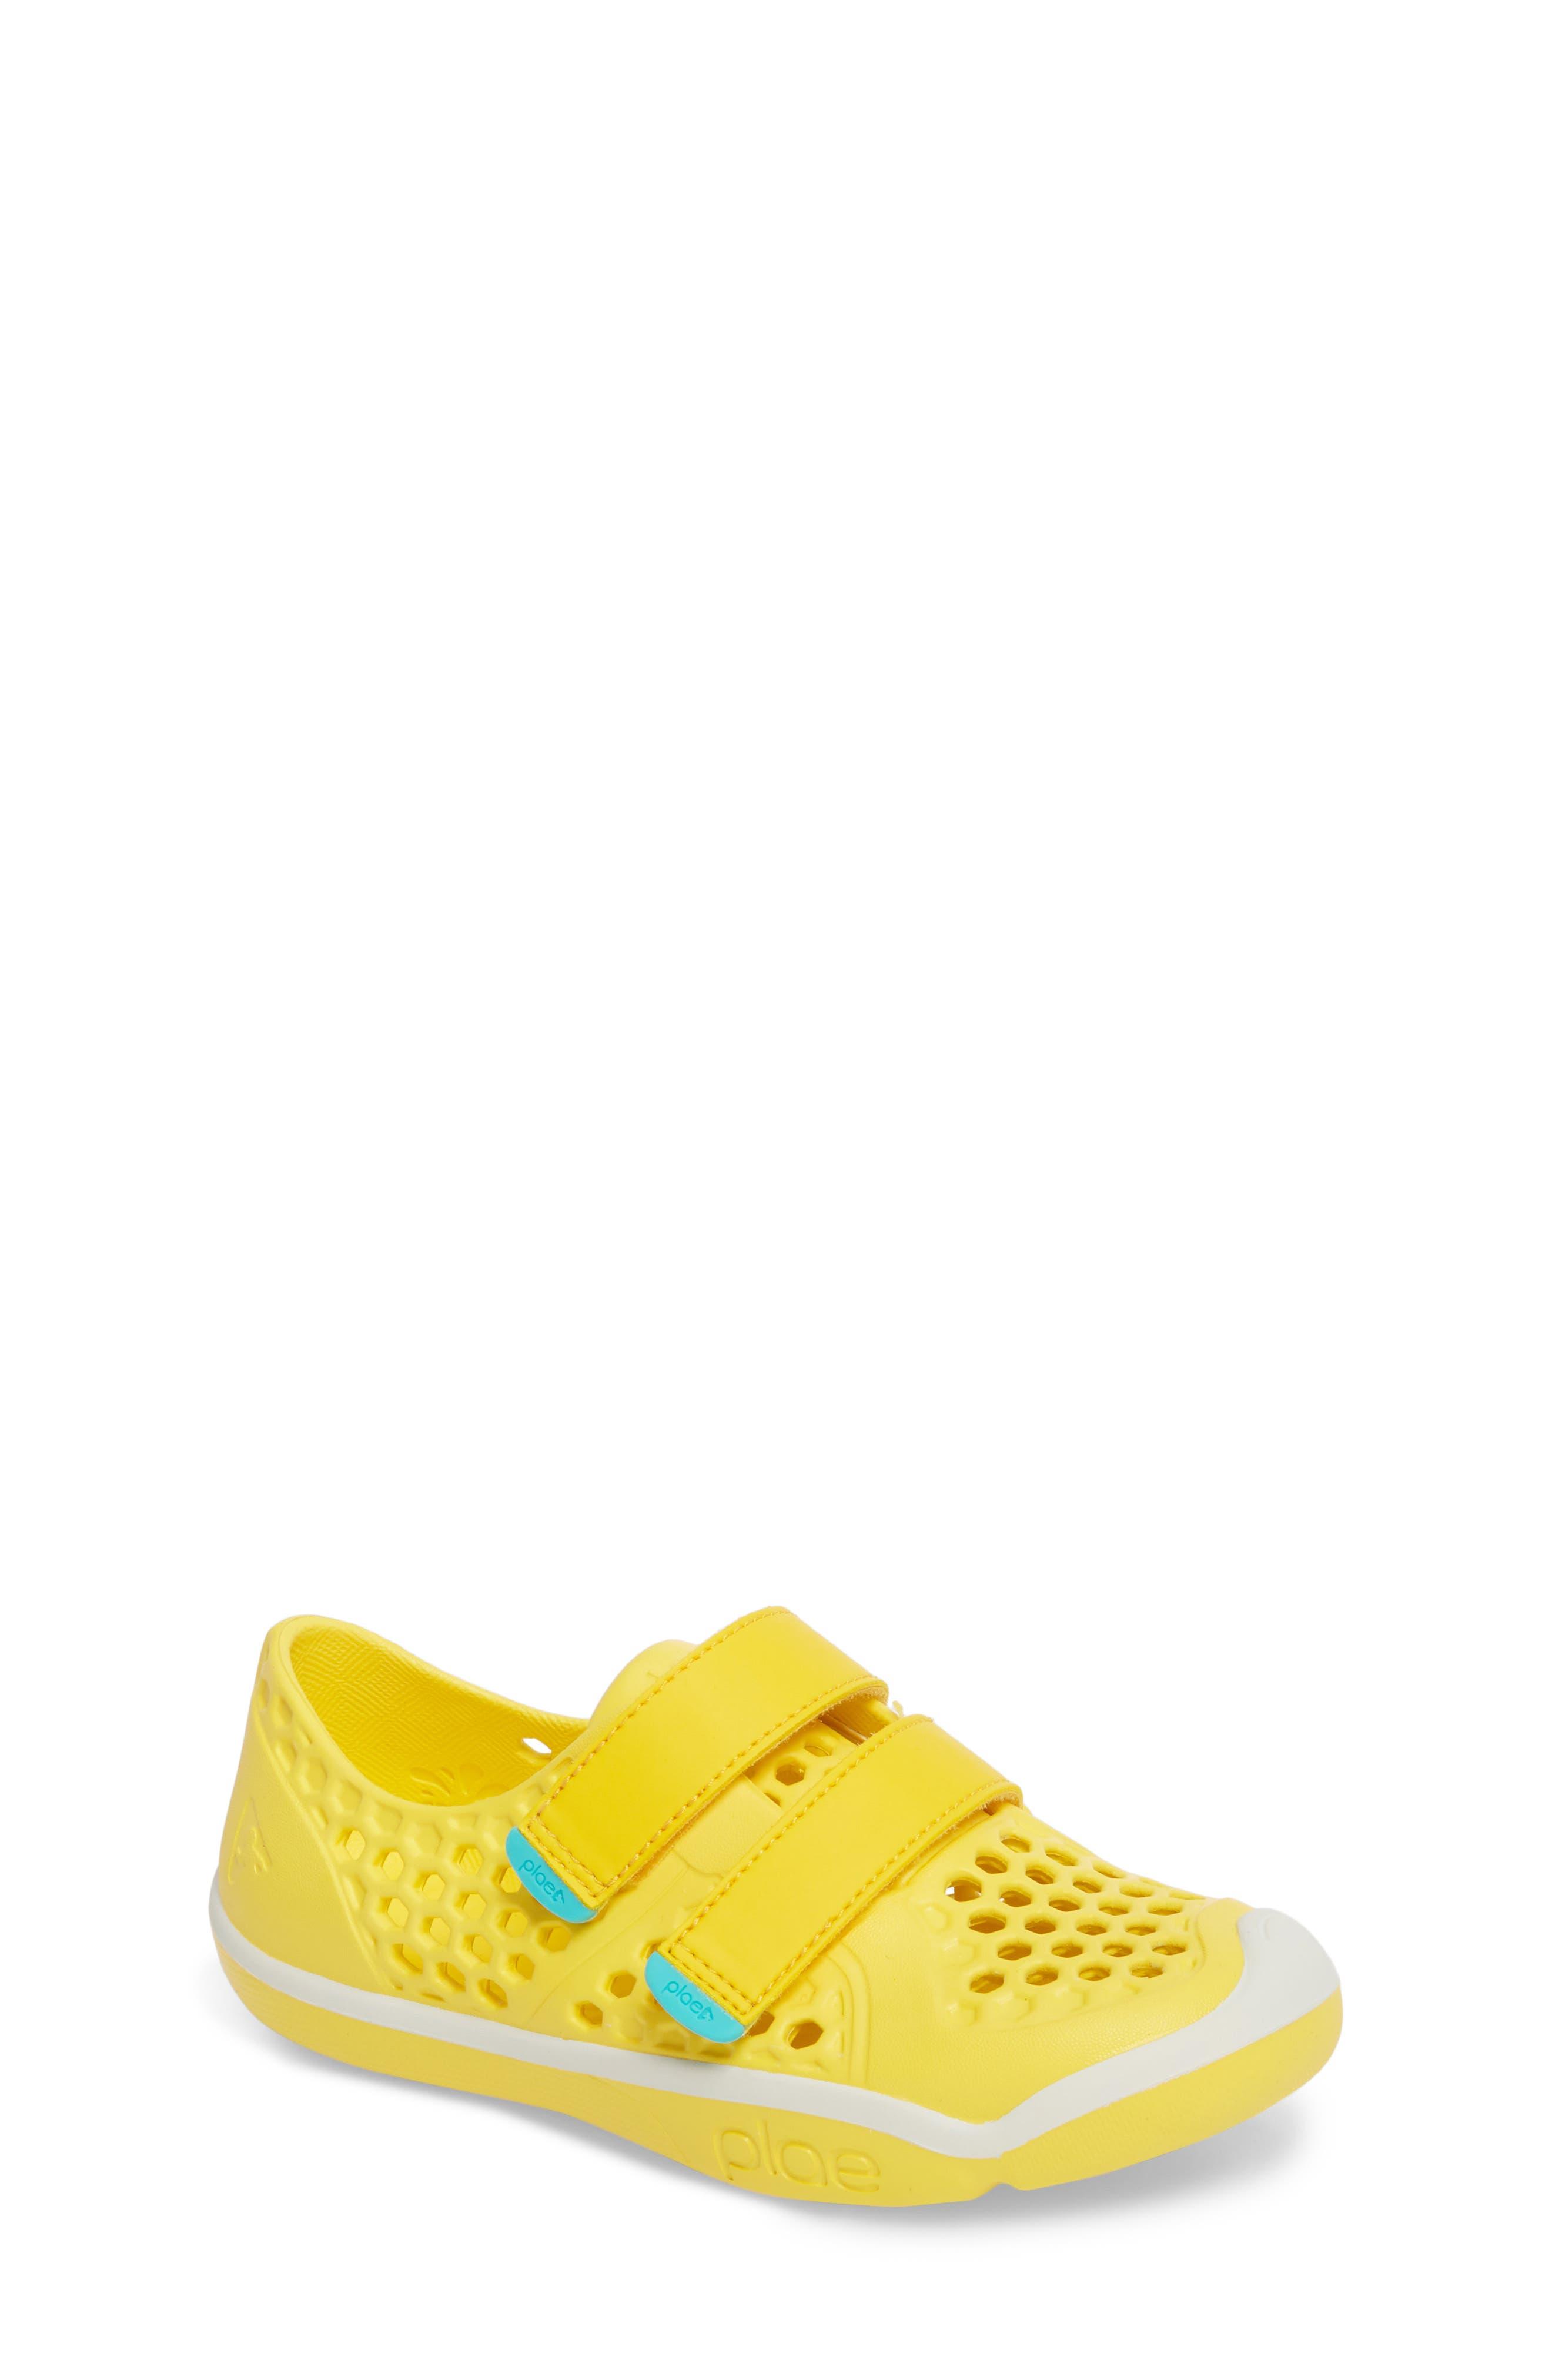 Mimo Customizable Sneaker,                             Main thumbnail 1, color,                             Dandelion